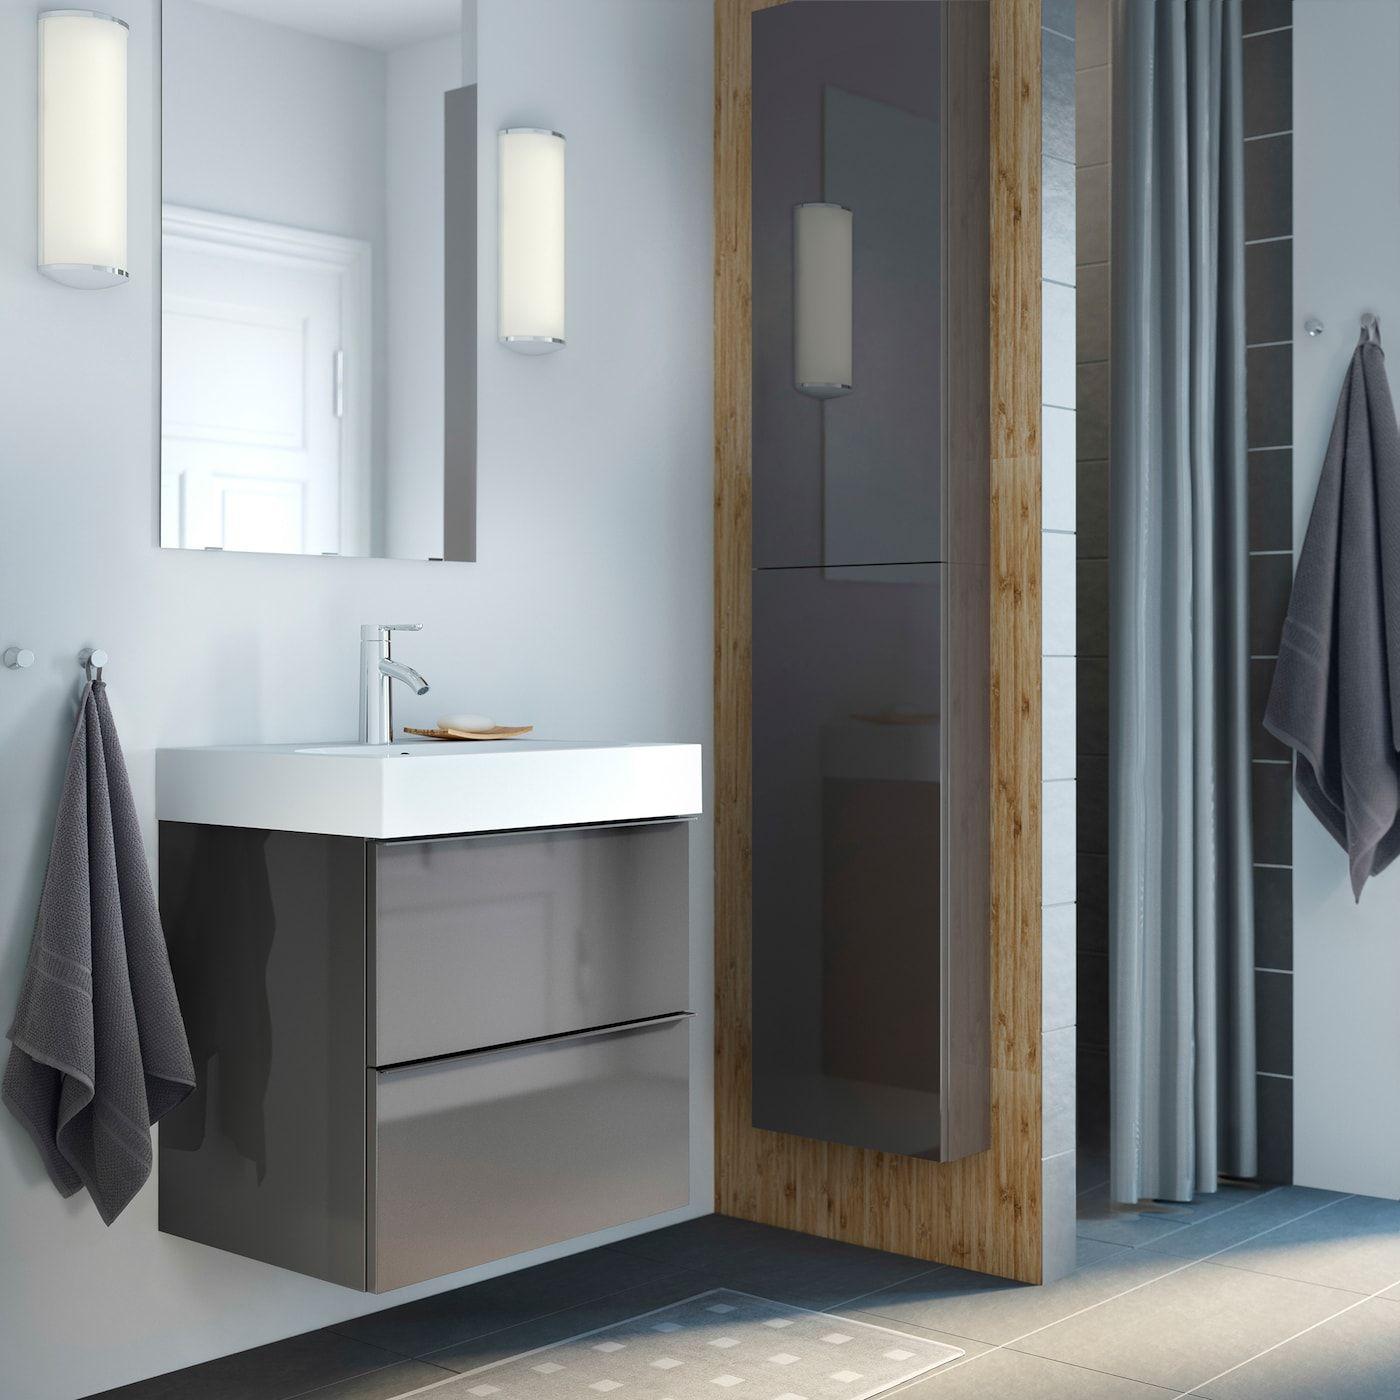 Badezimmer Ideen Inspirationen Ikea Godmorgon Badezimmer Im Erdgeschoss Badezimmer Wandschrank